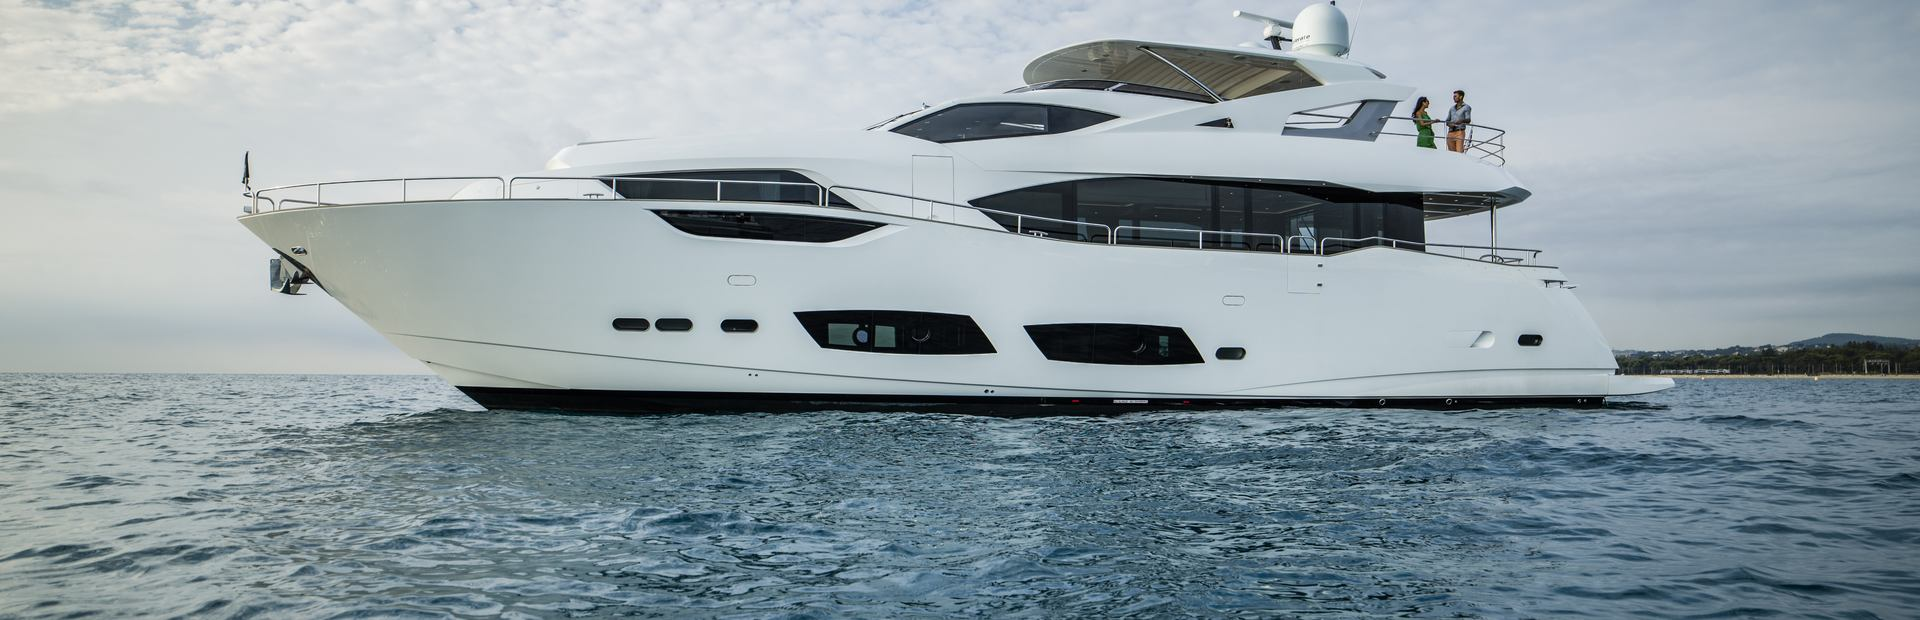 Sunseeker 95 Yacht Yacht Charter